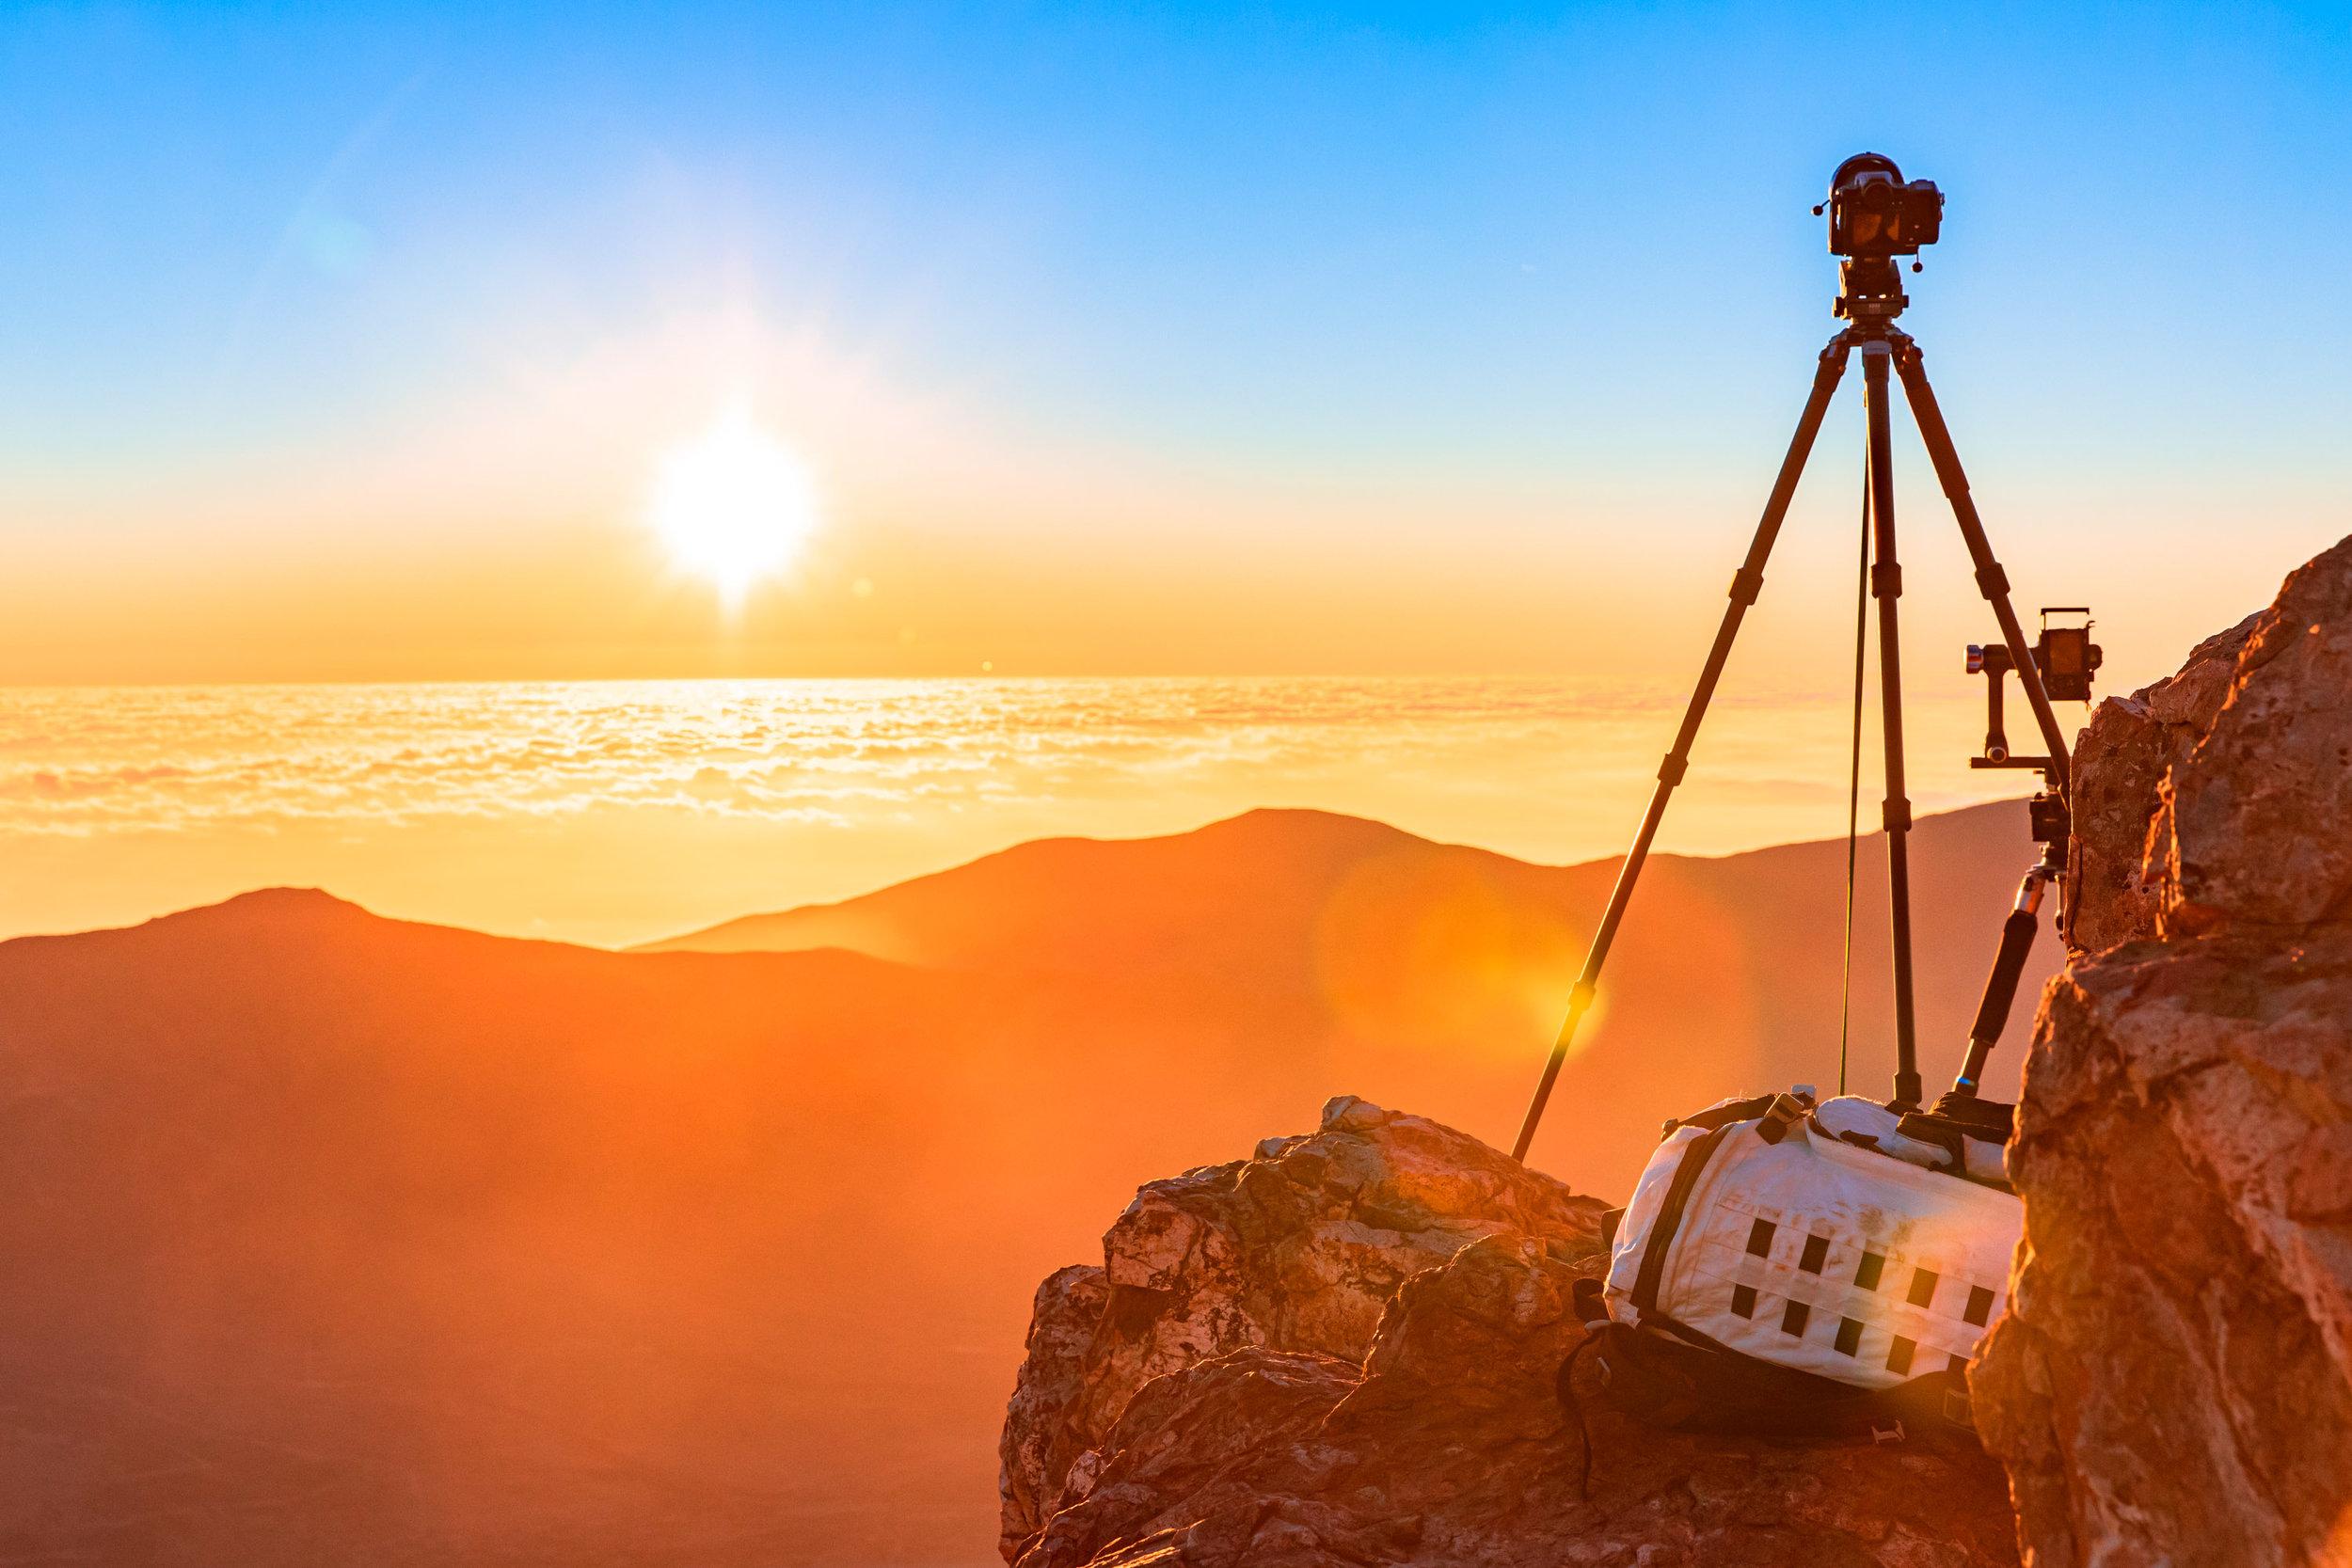 evanbdudley-Chile-Eclipse-19-0610.jpg